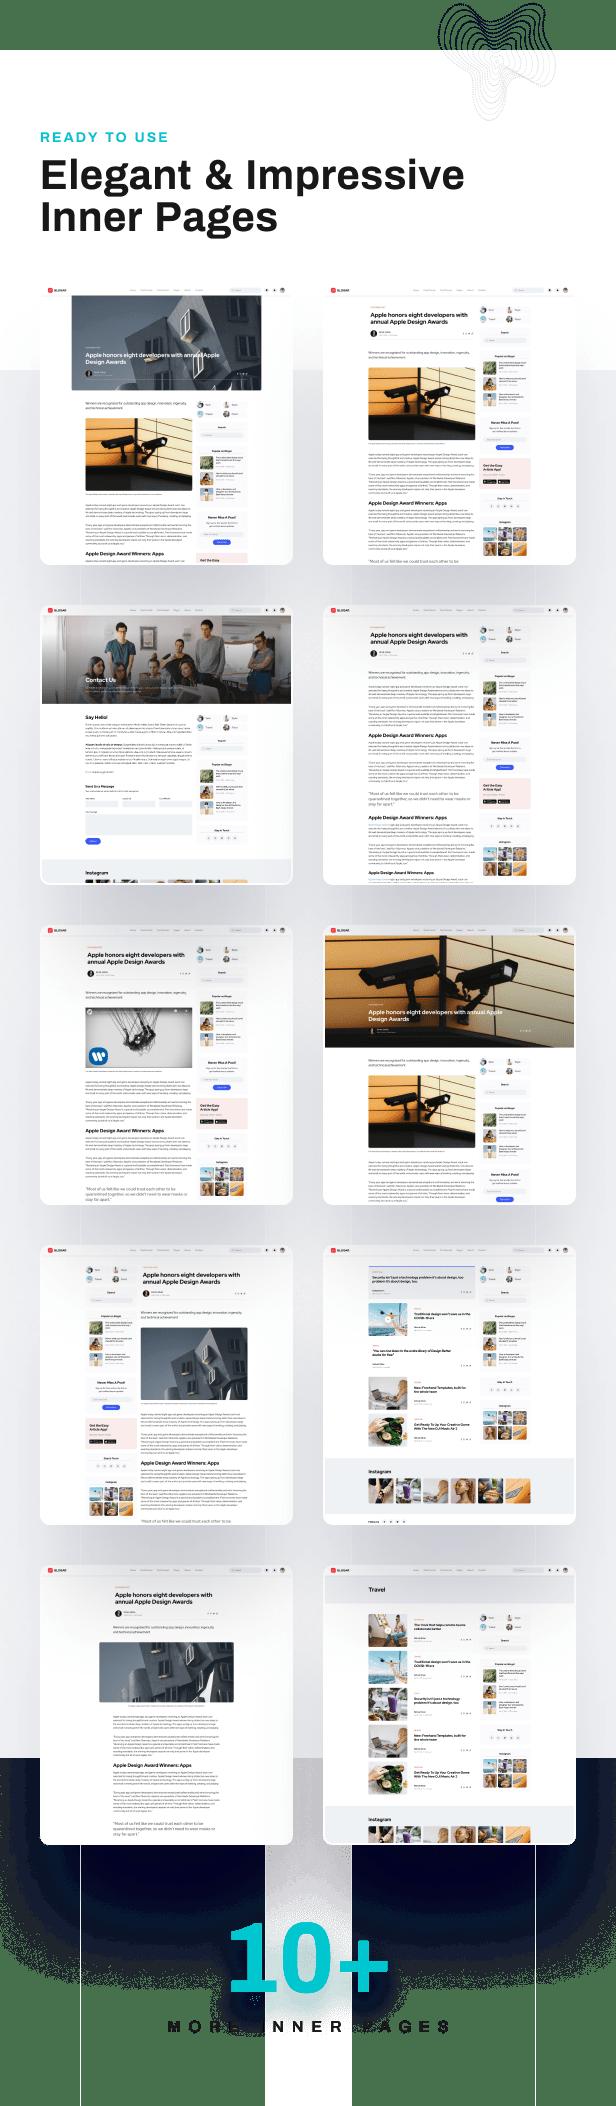 Blogar - Blog Magazine WordPress Theme - 5